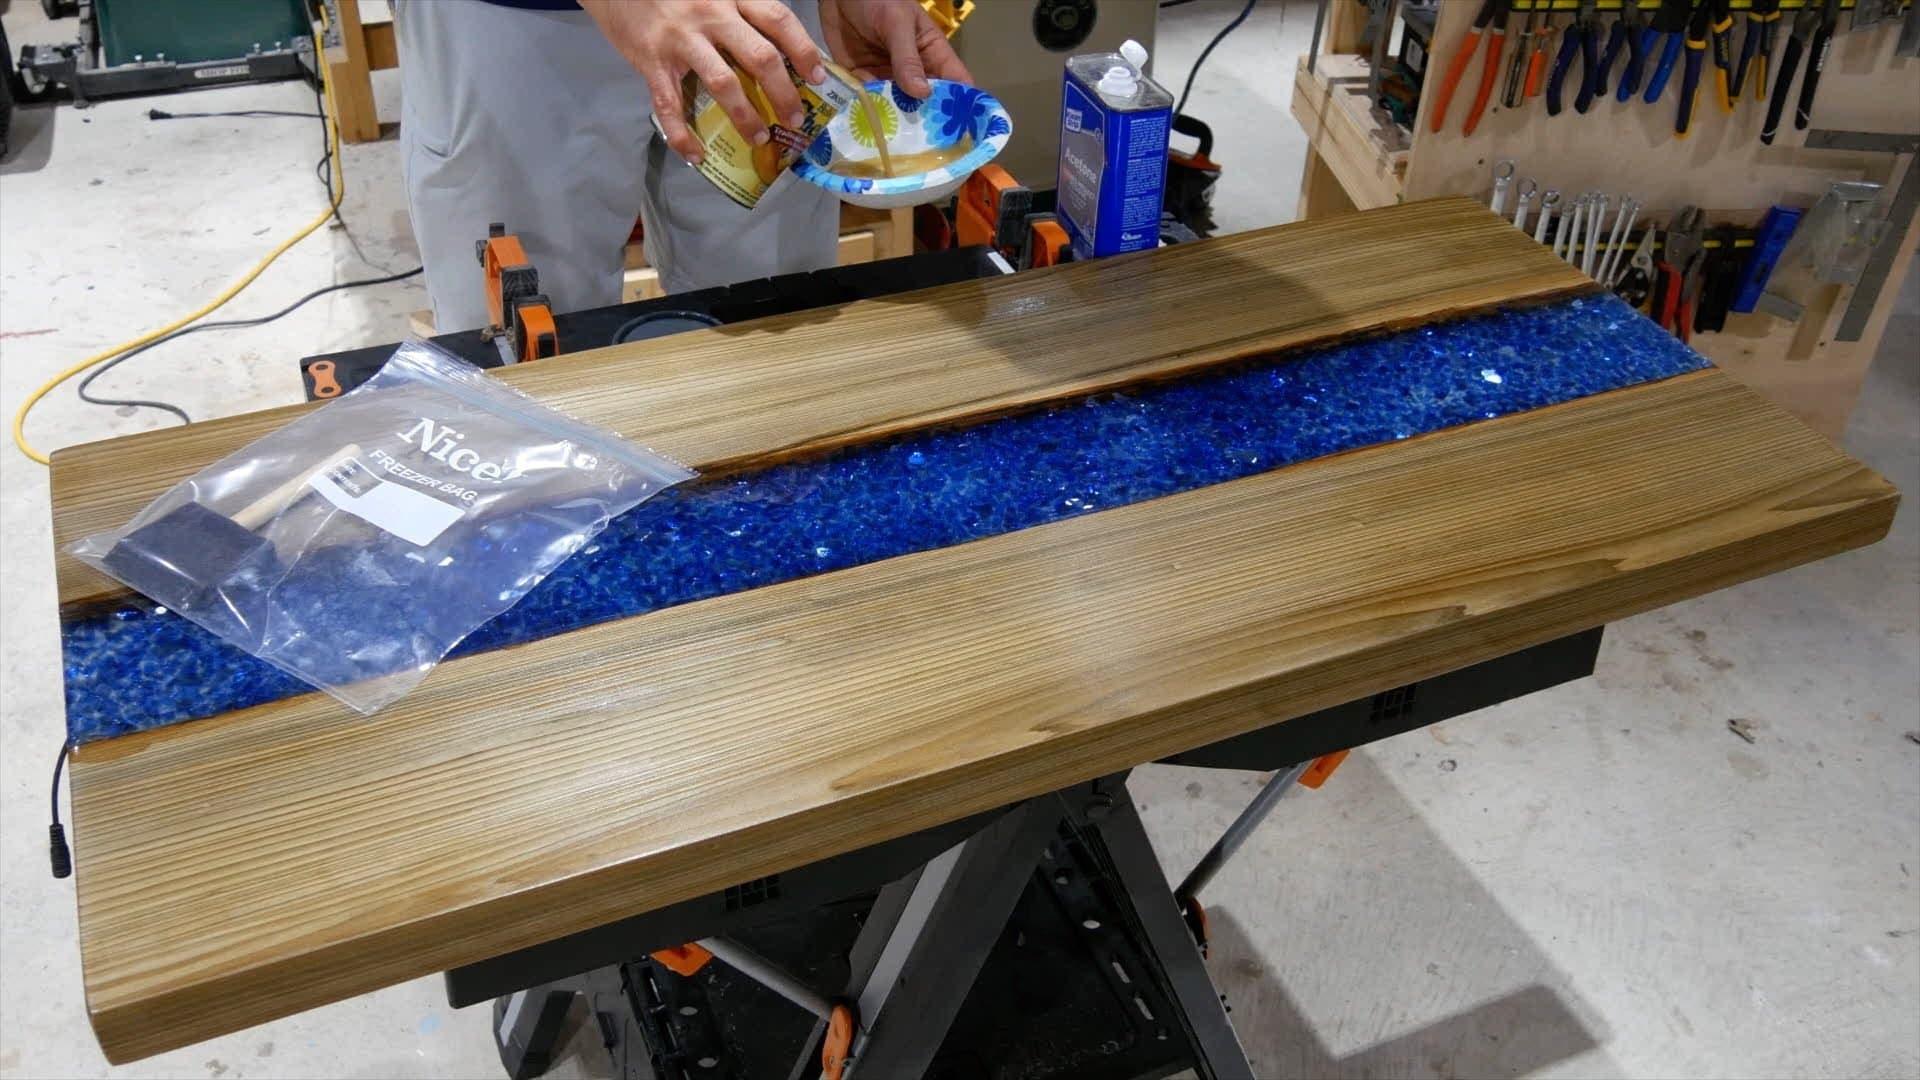 epoxy-resin-river-table-glowpowder_20171016_83